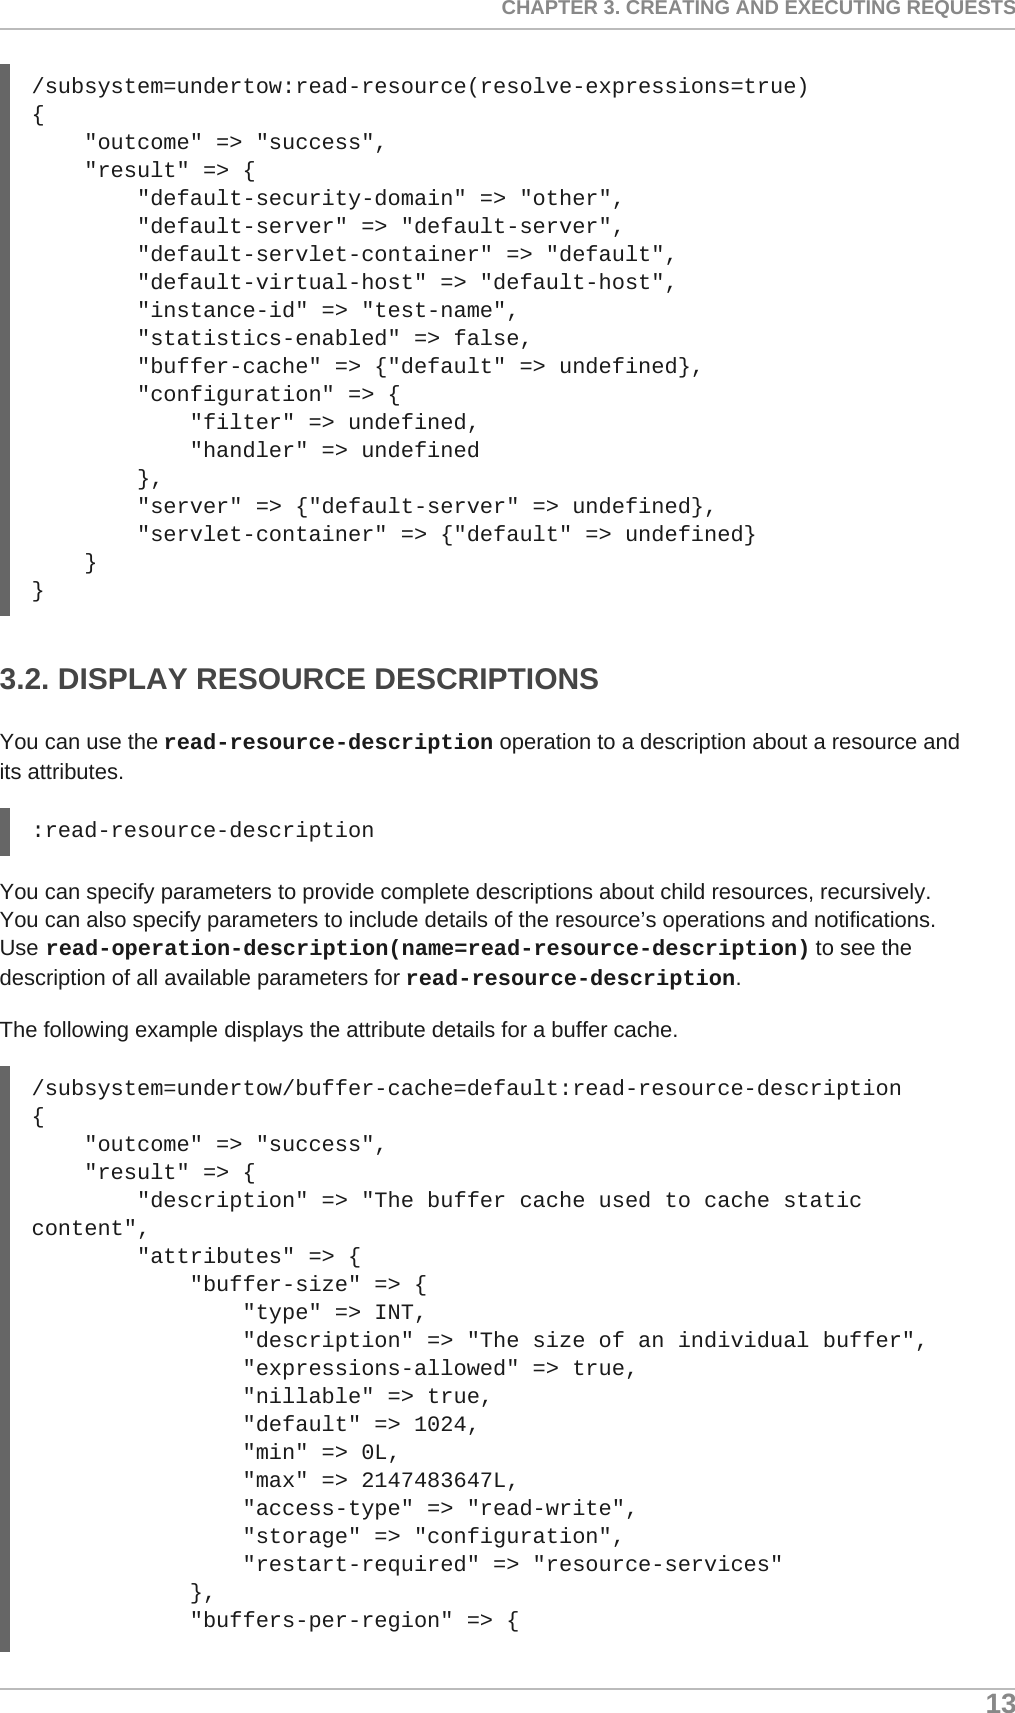 Red Hat JBoss Enterprise Application Platform 7 0 Management CLI